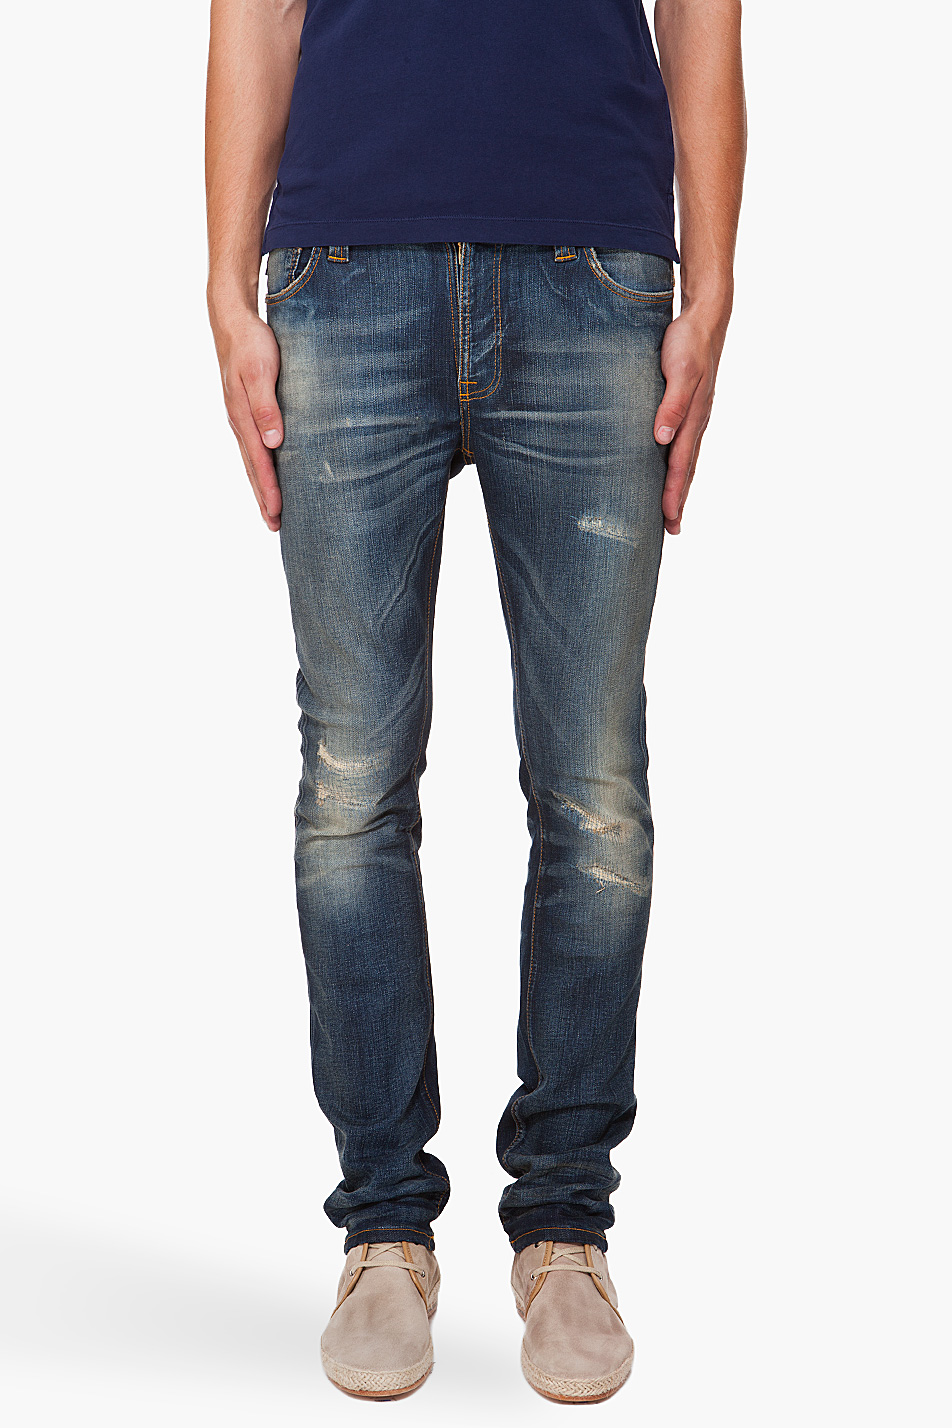 Lyst Nudie Jeans Thin Finn Peter Replica Blue In